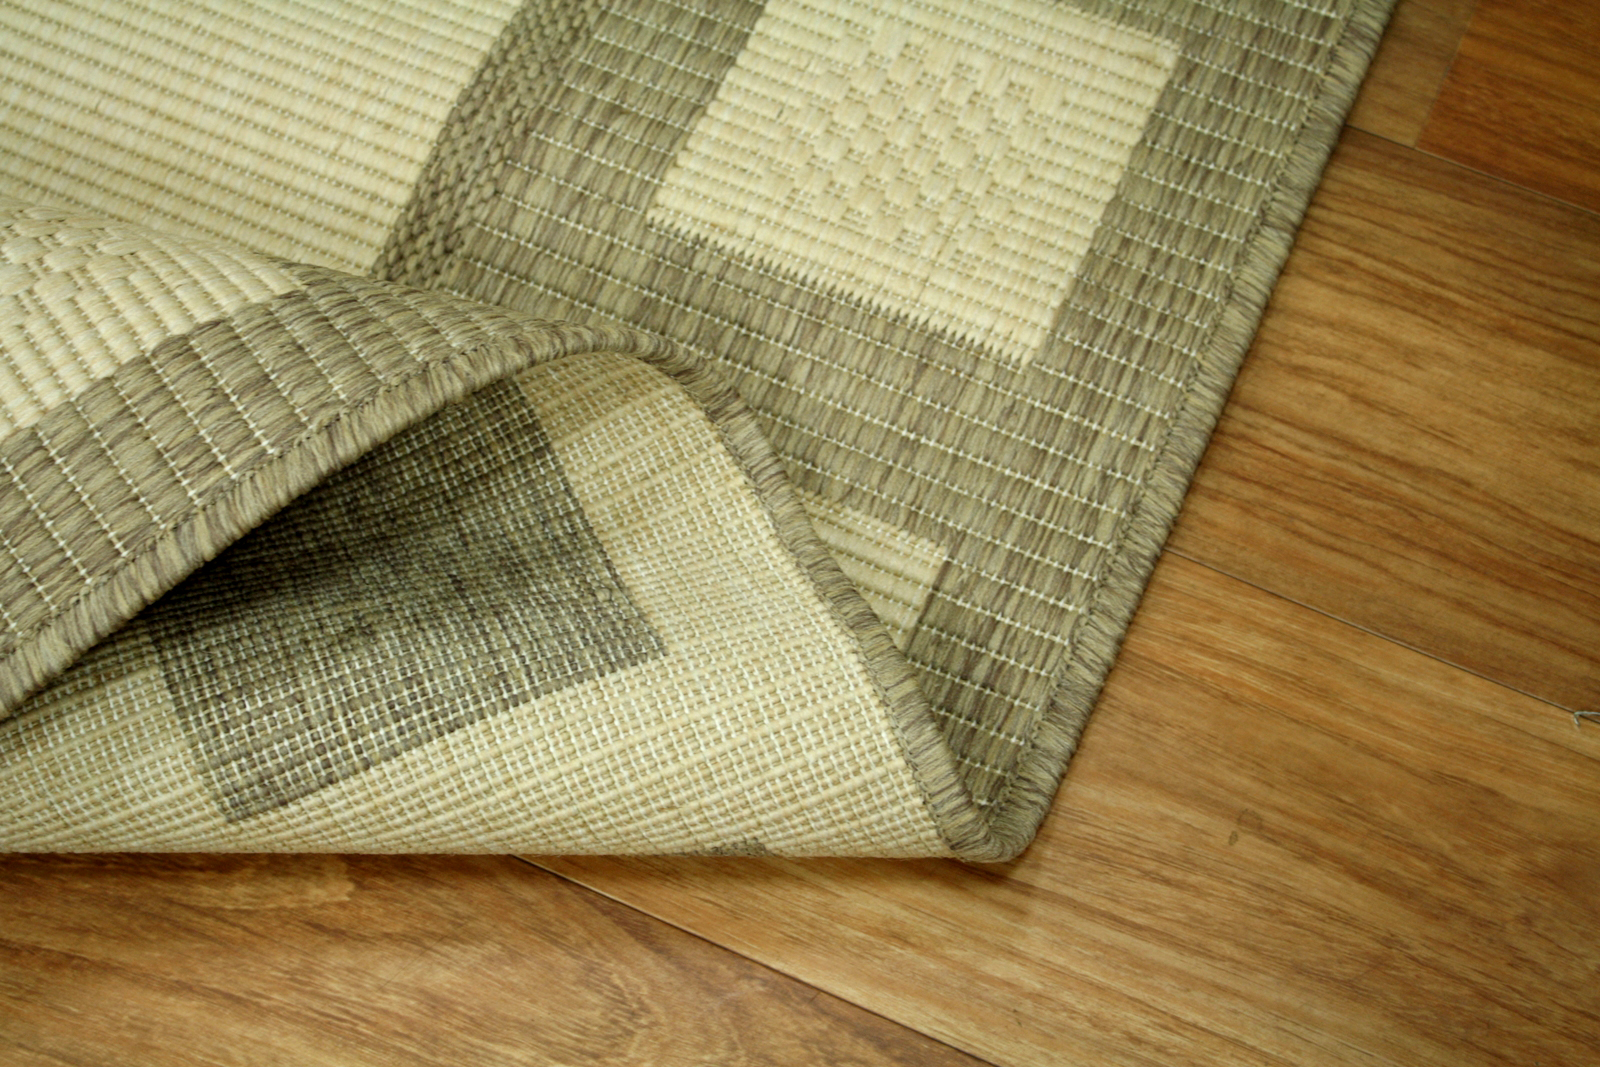 Teppich Agnella Diuna Tyto vanilla flach gewebt s1  eBay